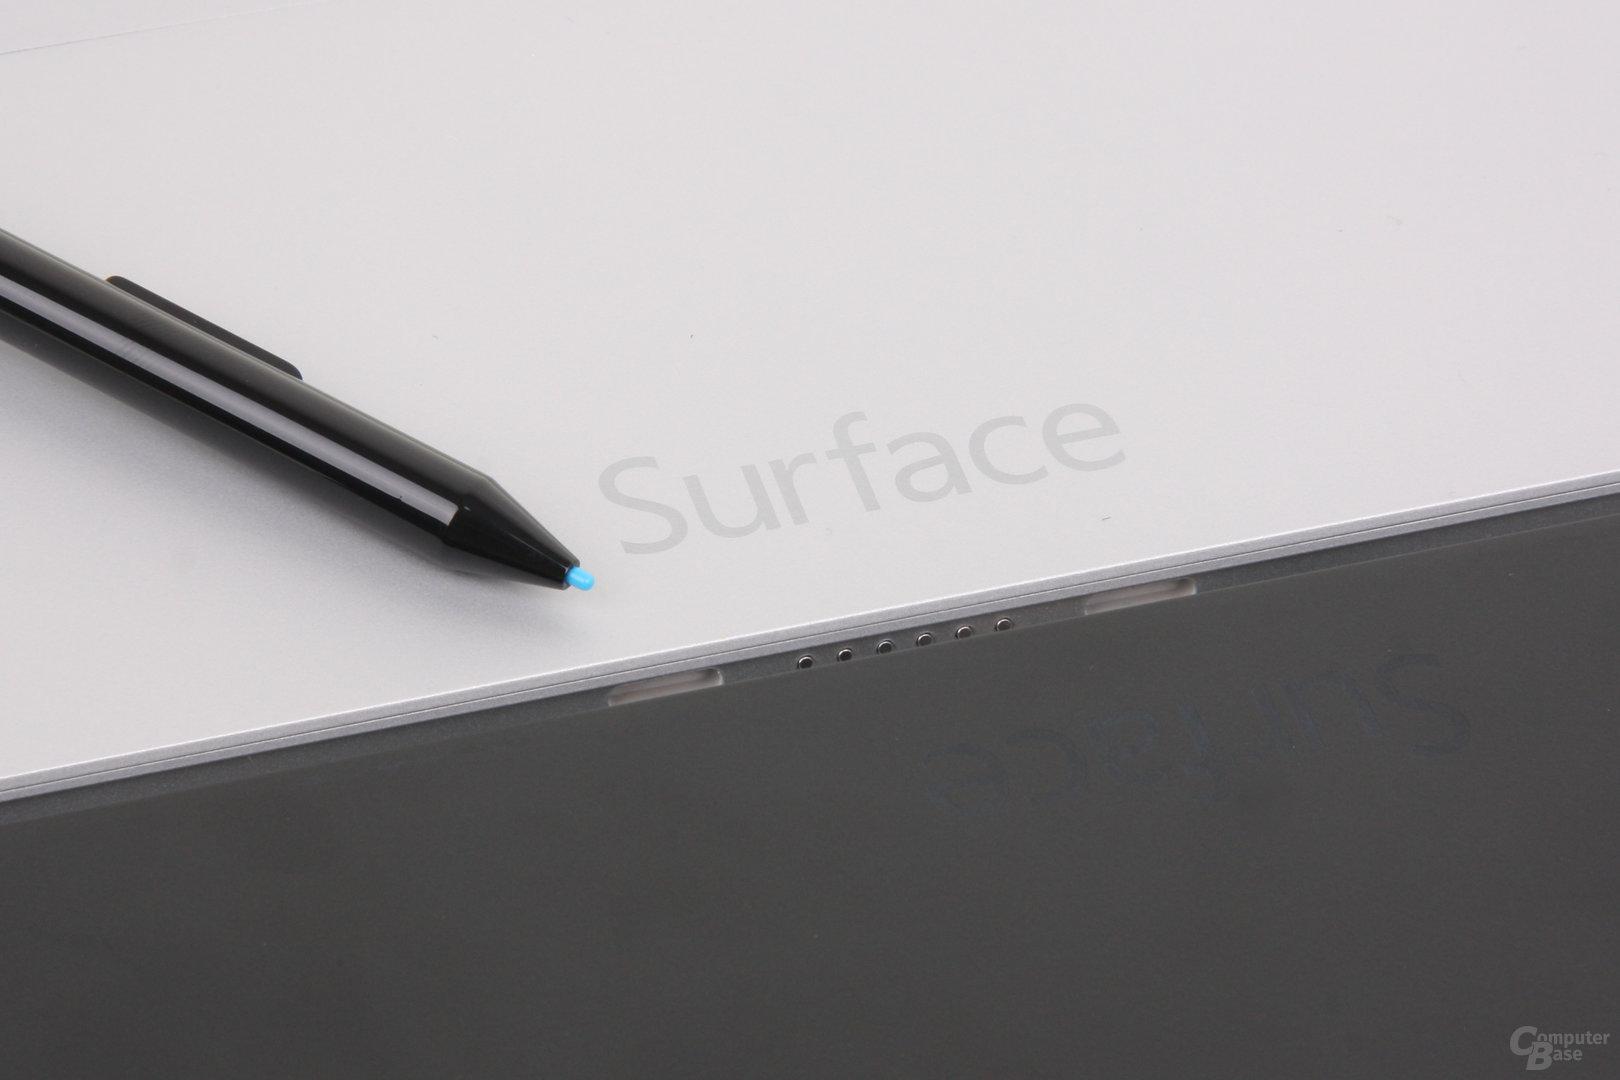 Surface 2 / Surface Pro 2 / Stylus